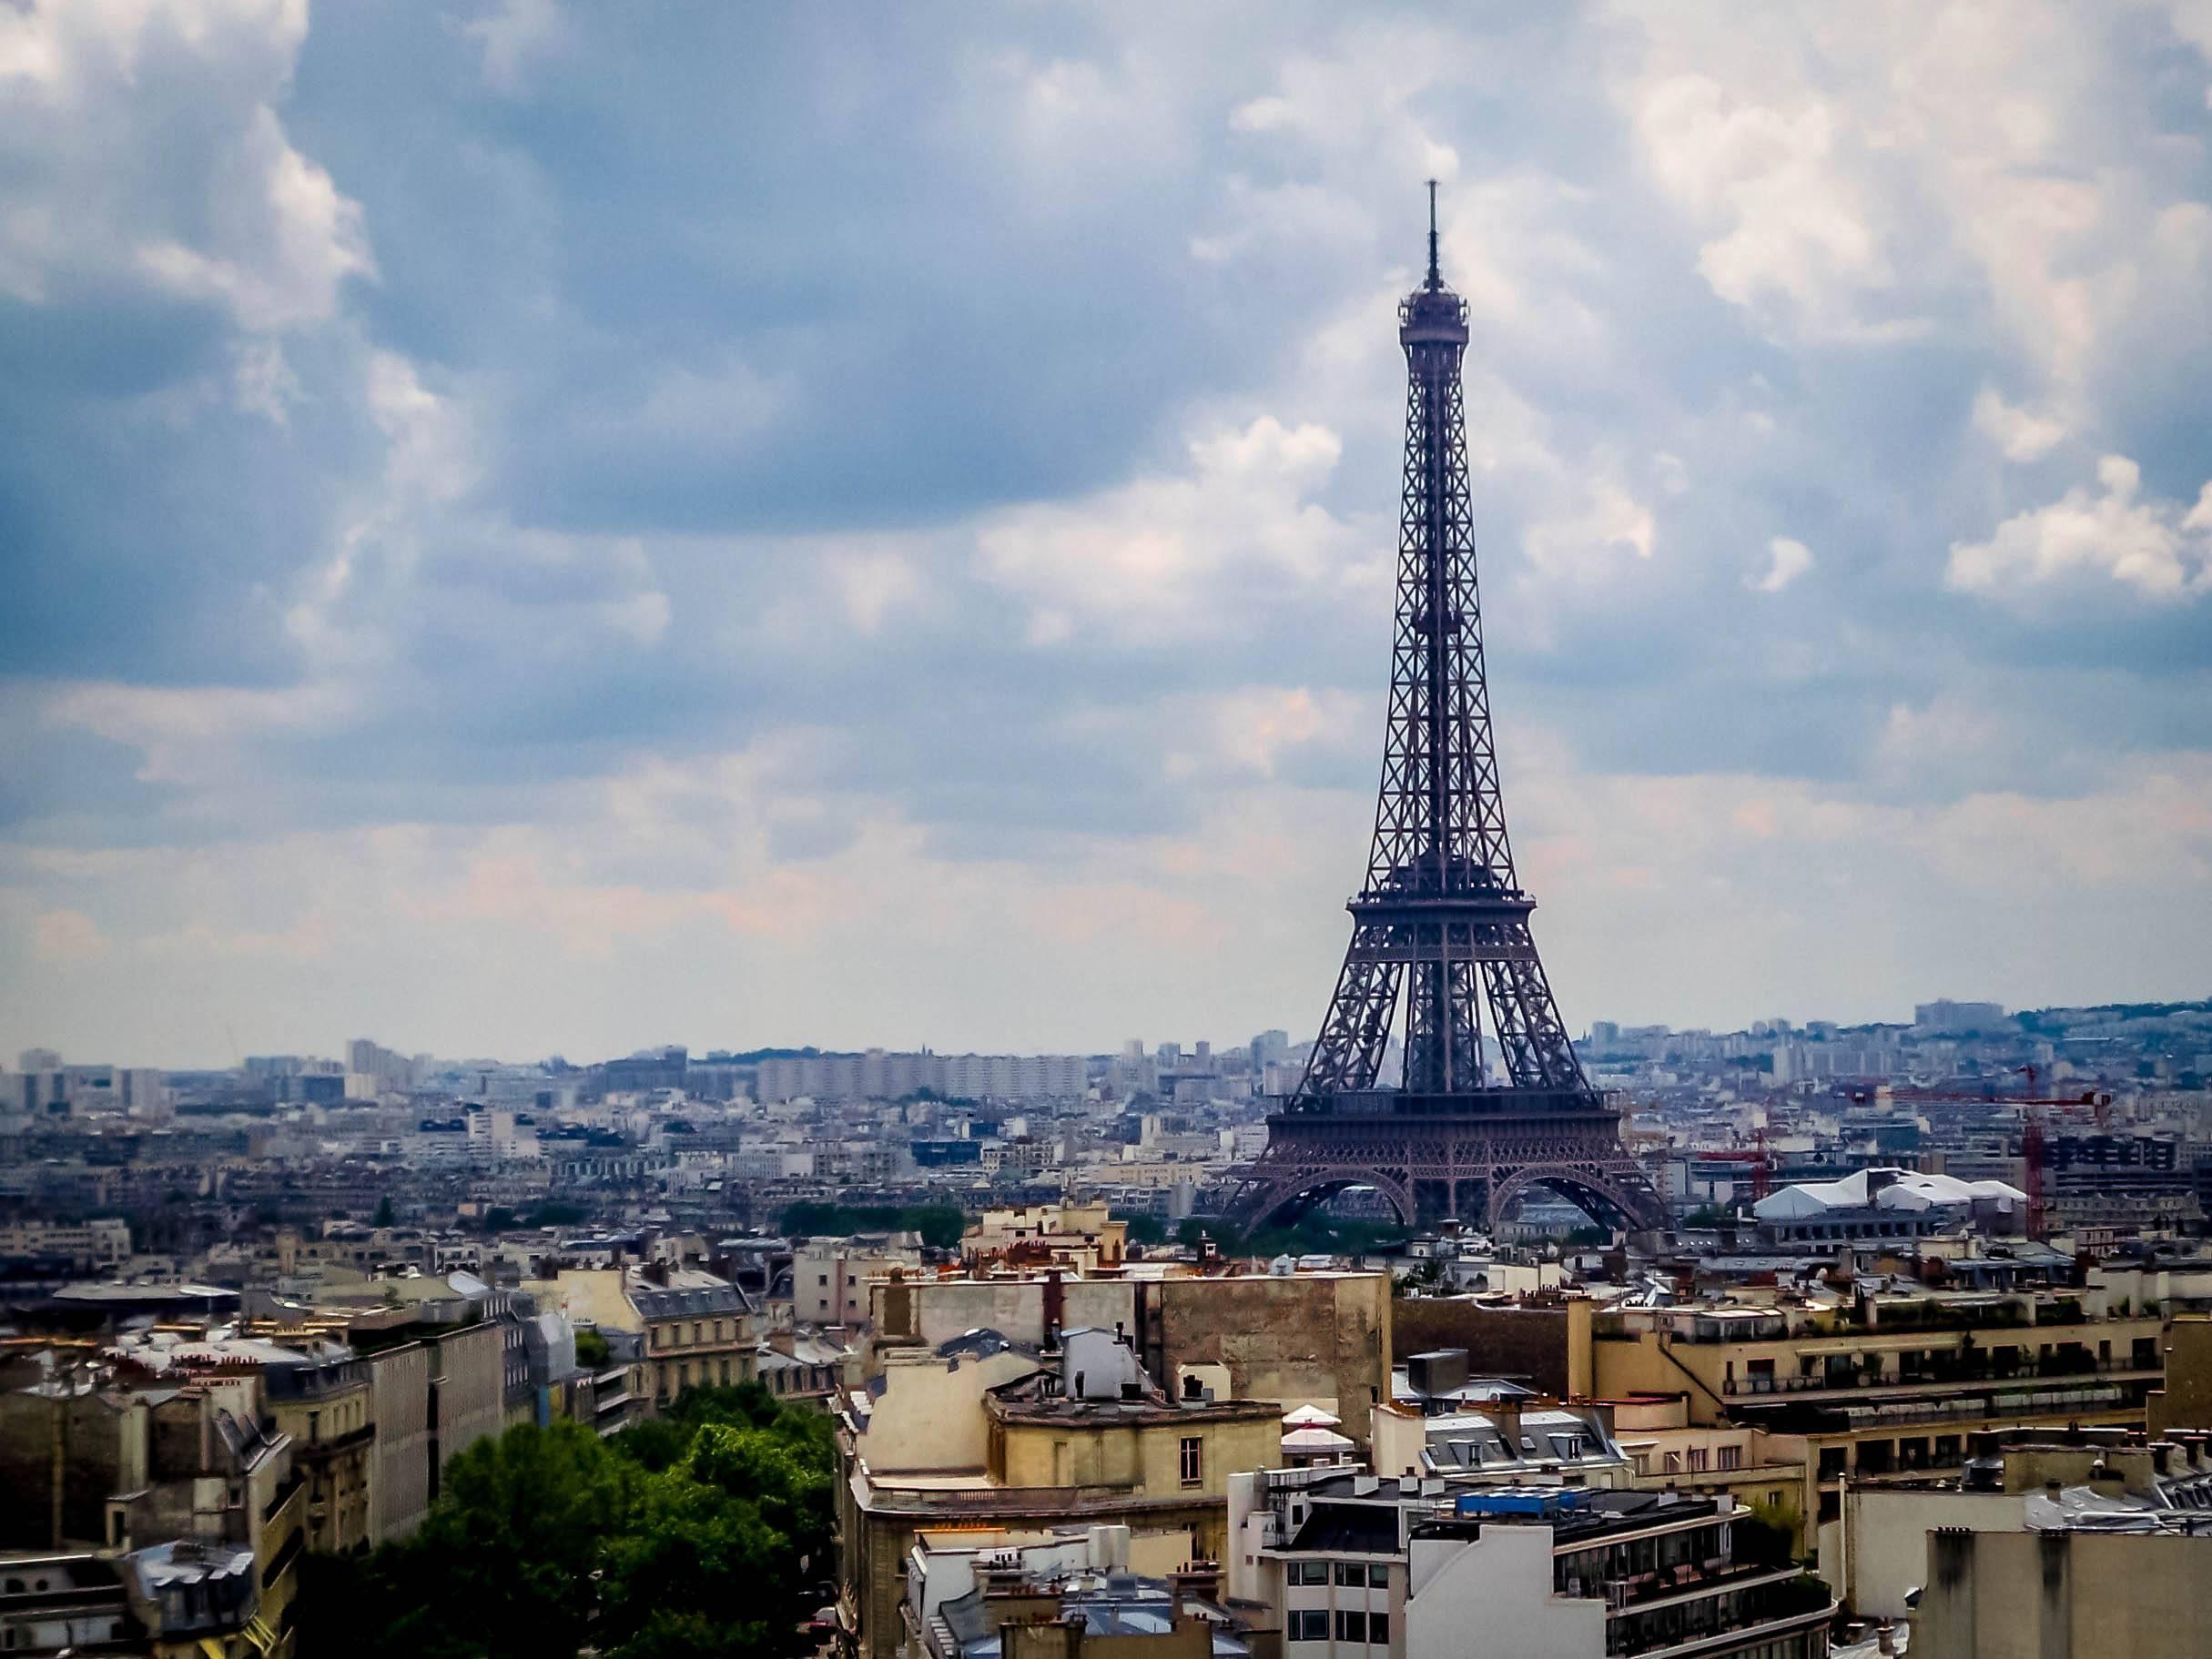 The Eiffel Tower in Paris